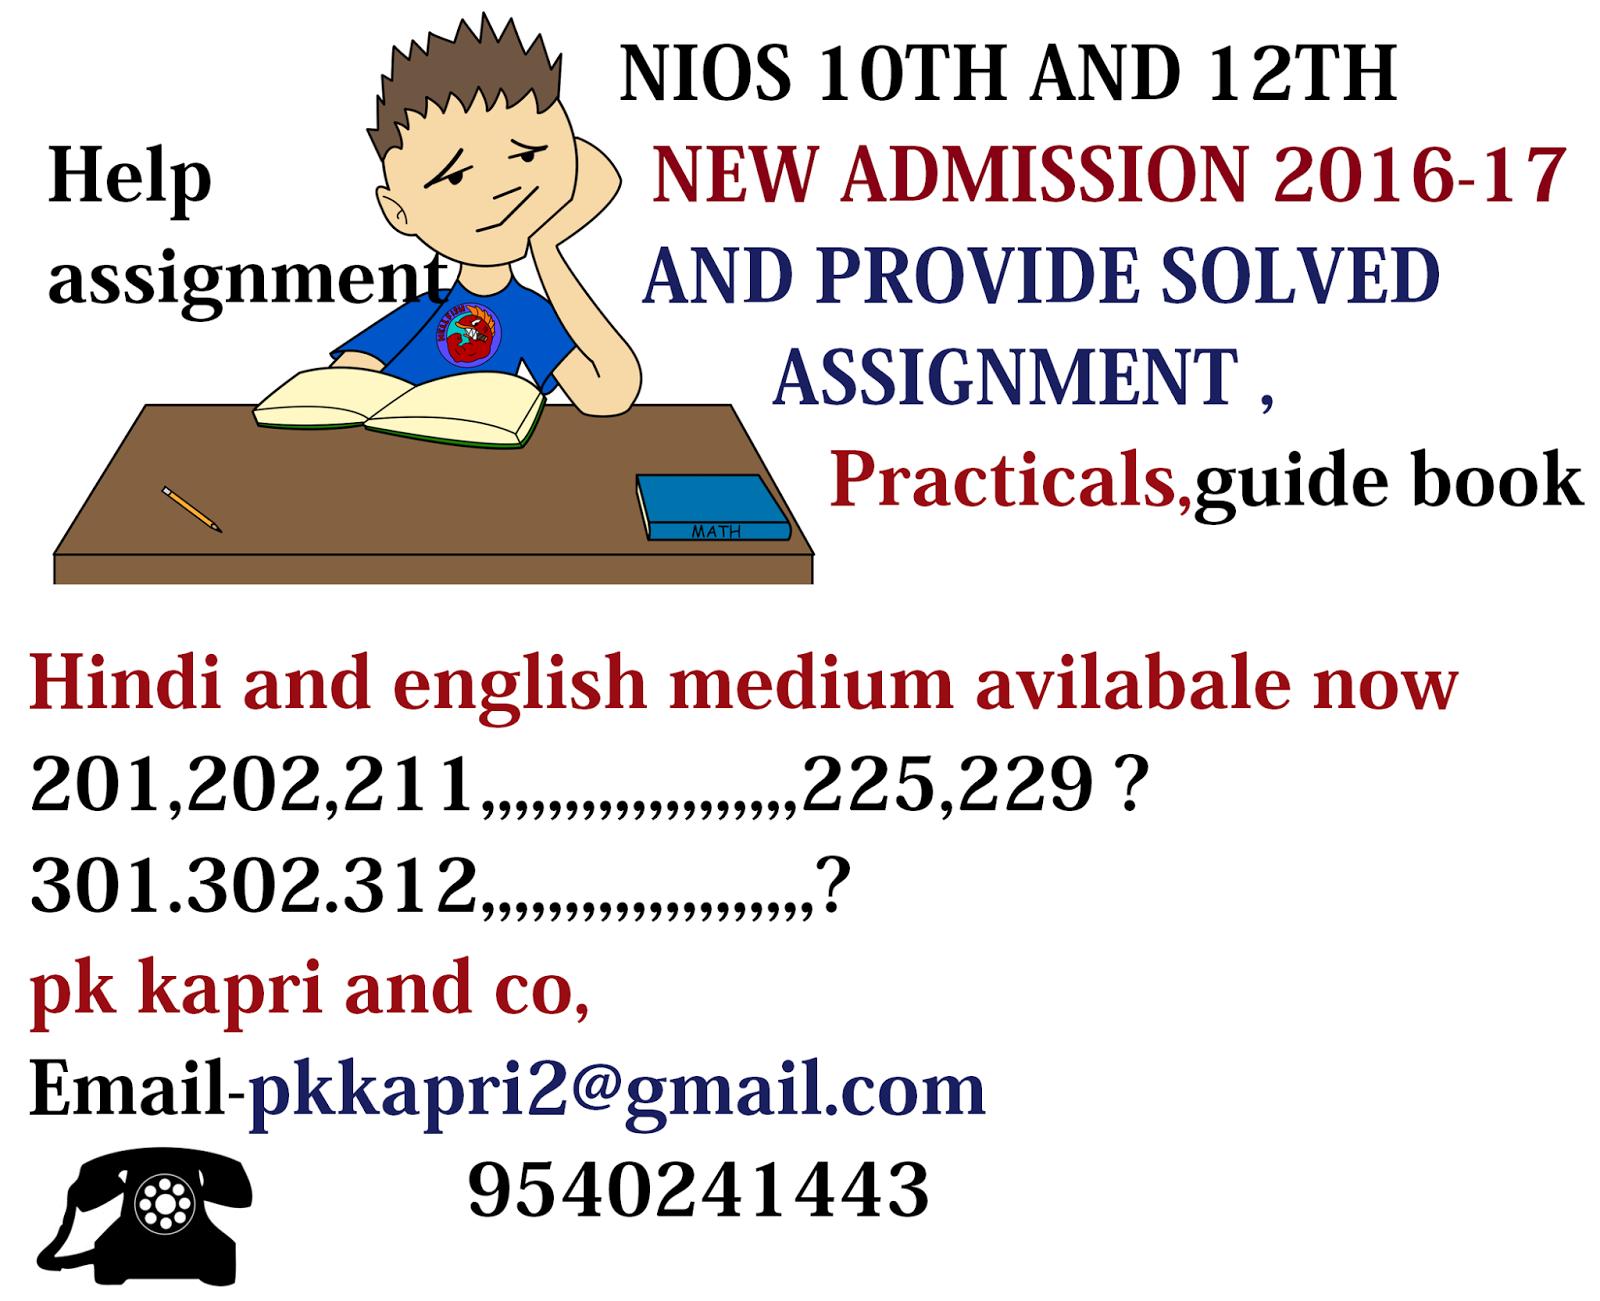 m com ignou Ignou solved assignment guru bca mca ba ma bdp bcom mcom bba mba bed bsc msc solution 2018-19 july 2018 january 2019.